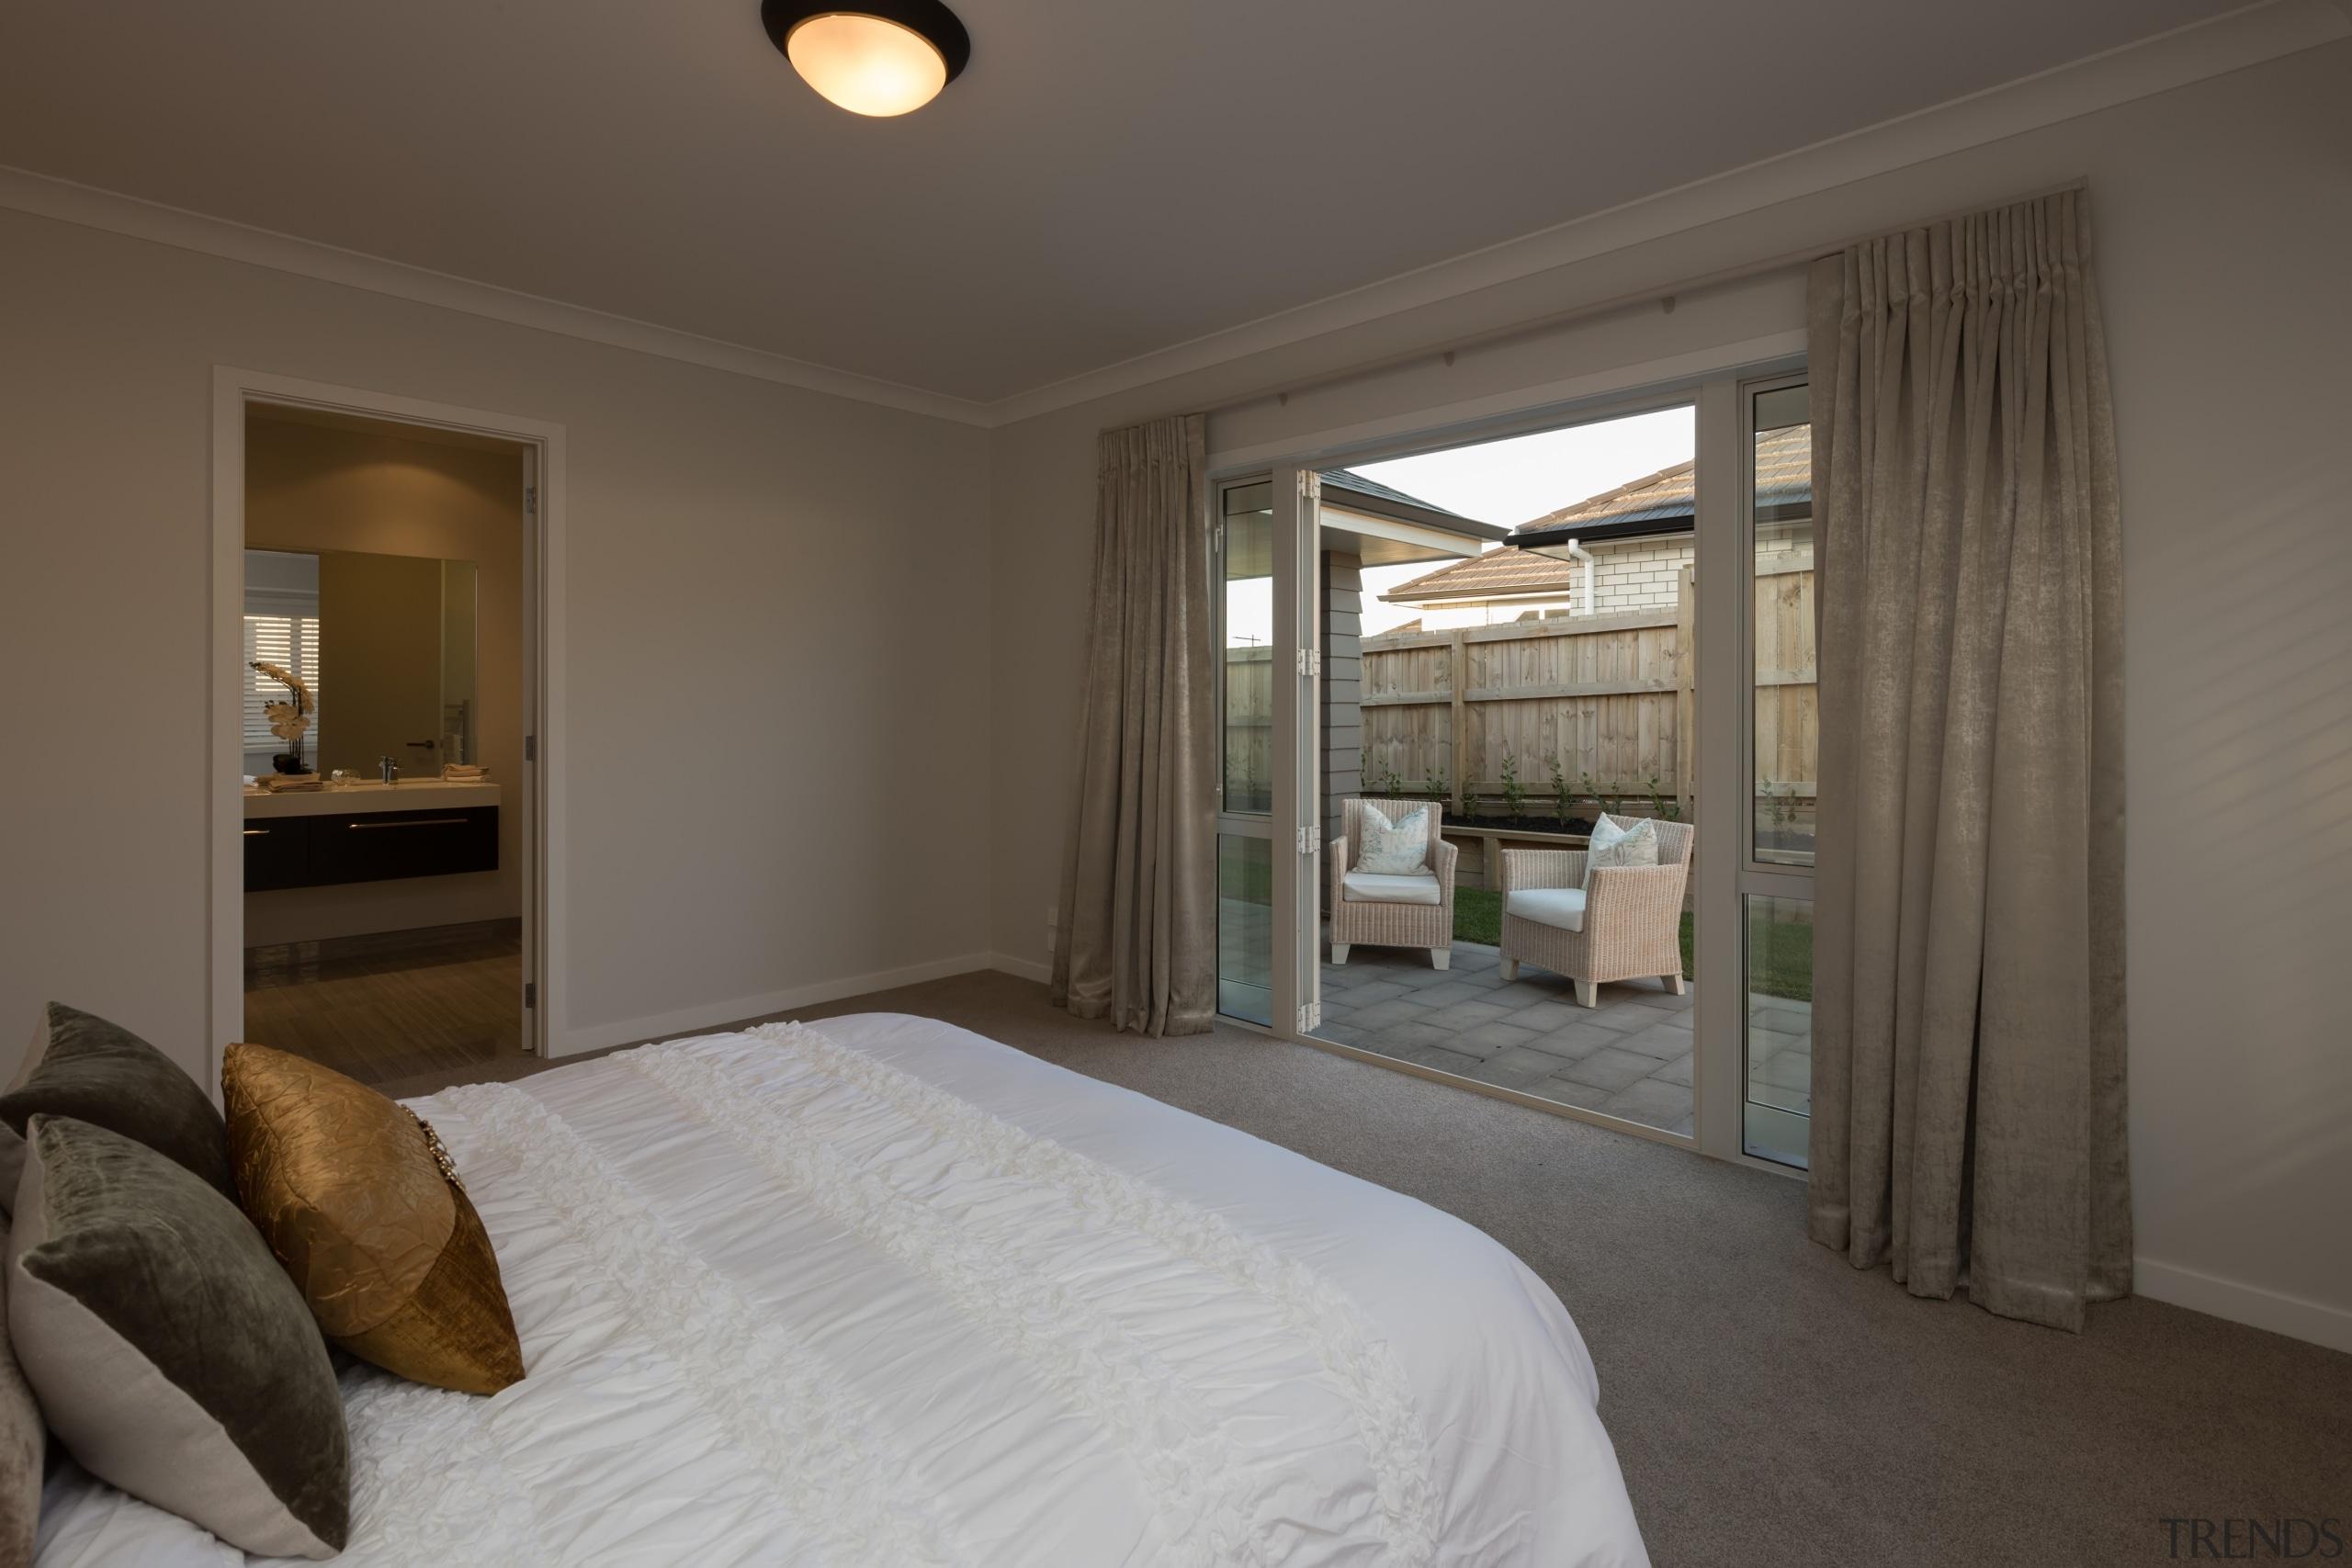 Landmark Homes Brookside Design Master Bedroom - Landmark bedroom, ceiling, estate, home, interior design, property, real estate, room, window, wood, gray